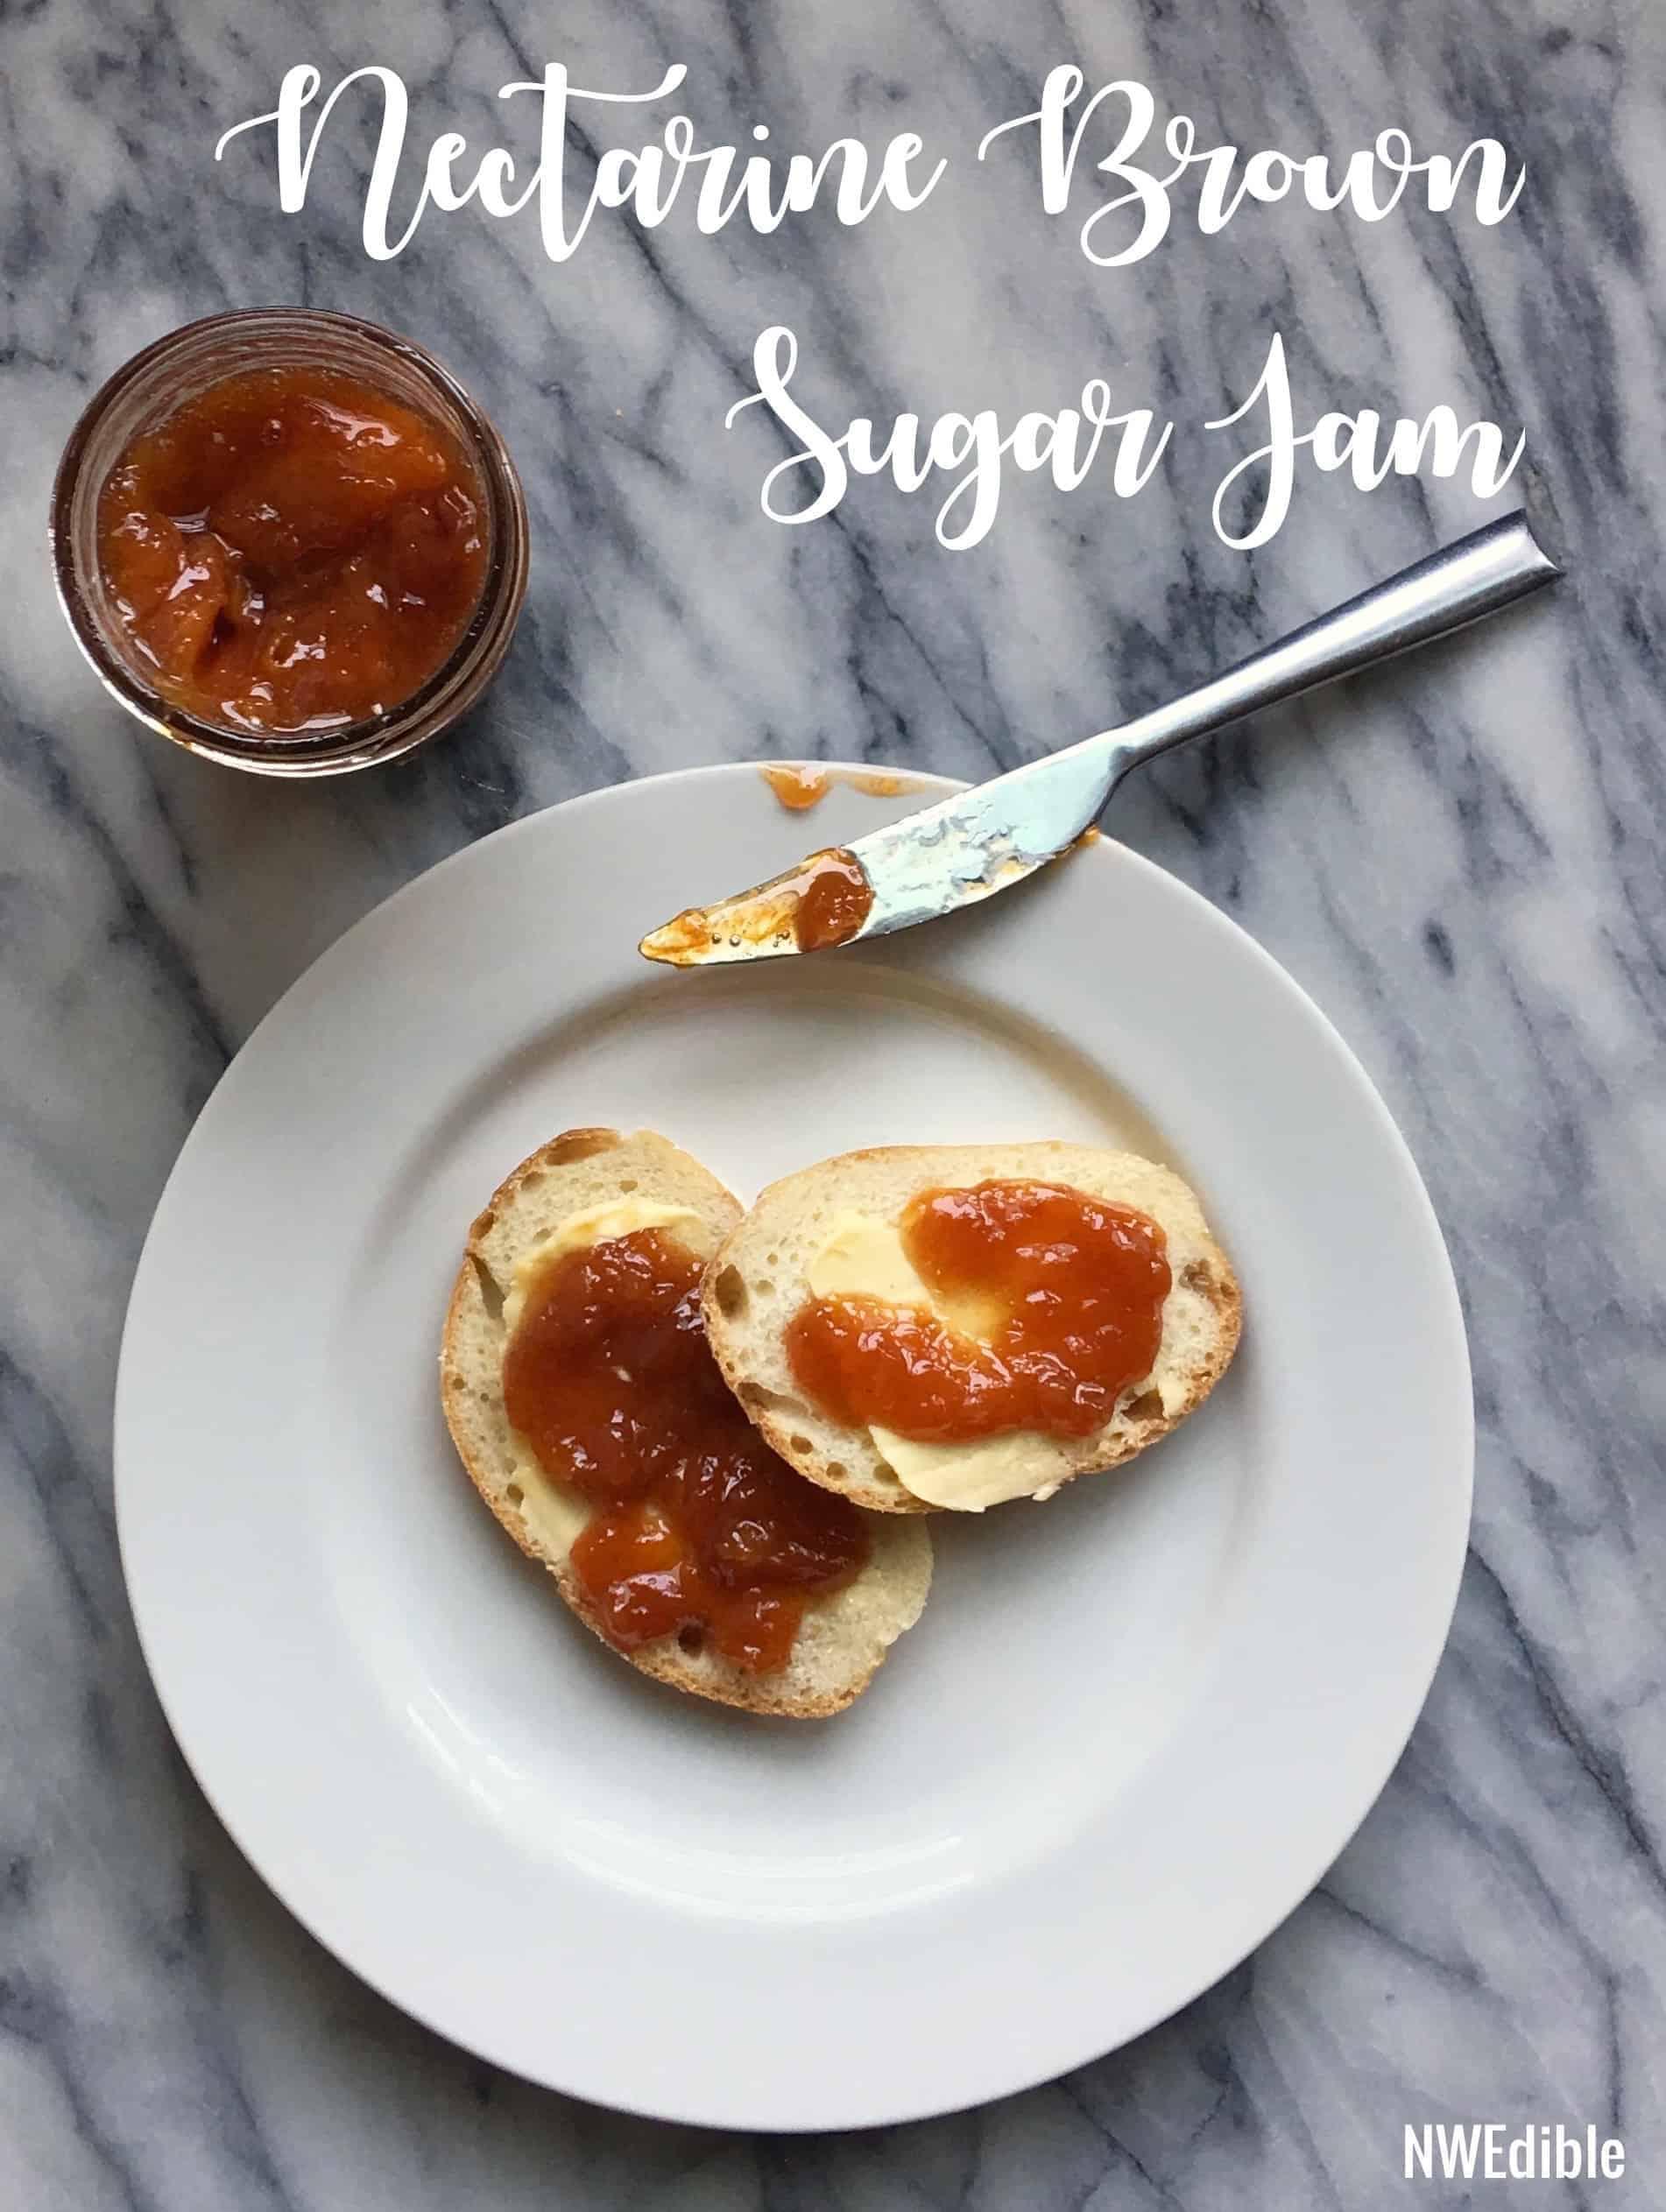 Nectarine Brown Sugar Jam Recipe